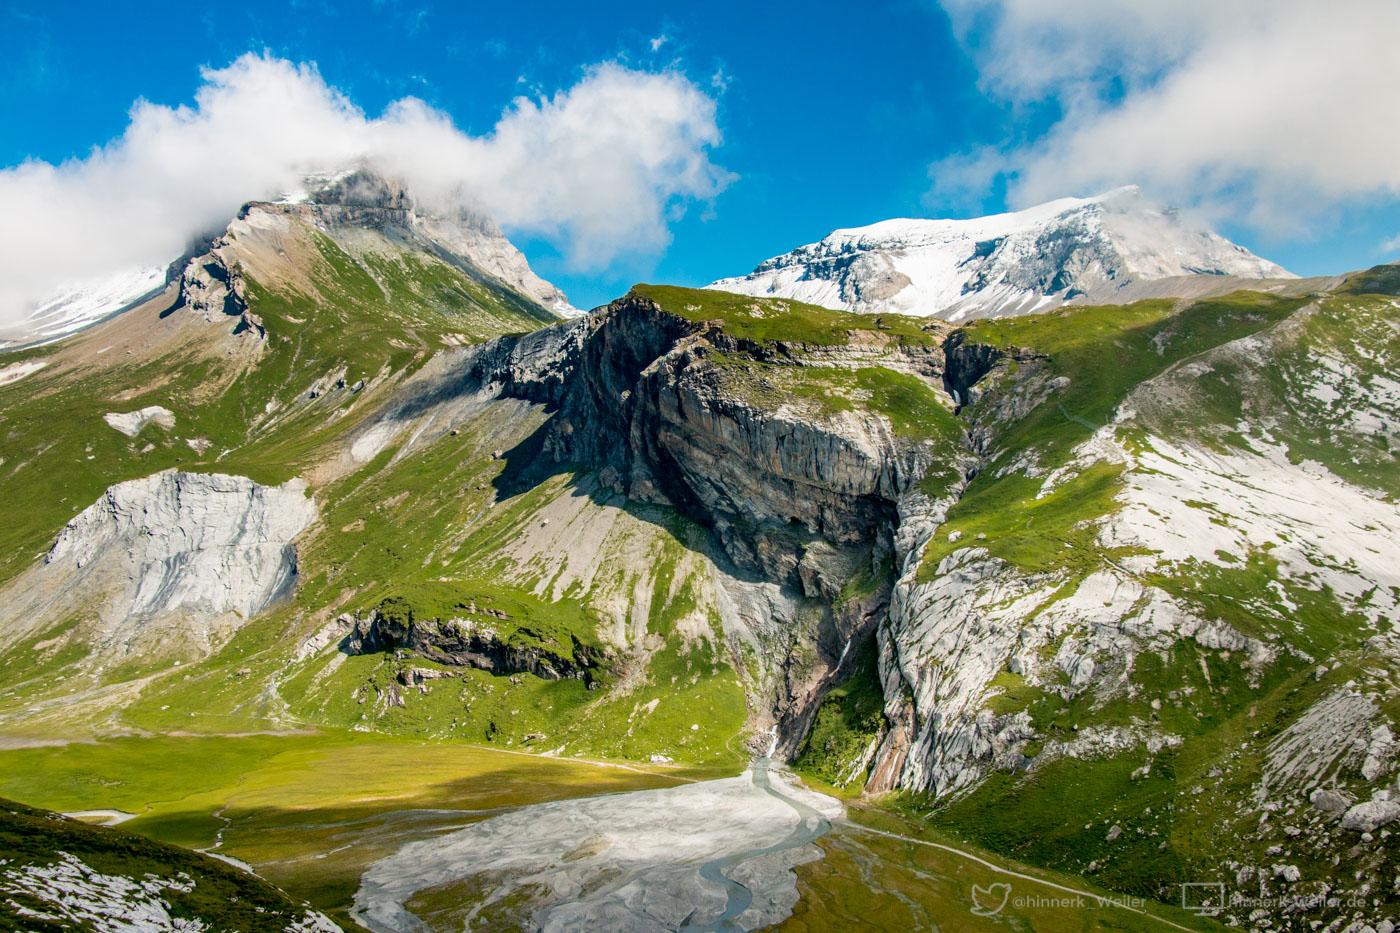 Alpen, Berge, Flem, Flims, Flüsse und Seen, Gebirge, Grauberg, Graubünden, Grisons, Lakes & Rivers, Natur & Landschaft, Piz Segnas, Schweiz, Seen & Flüsse, Umwelt, alpine, mountains